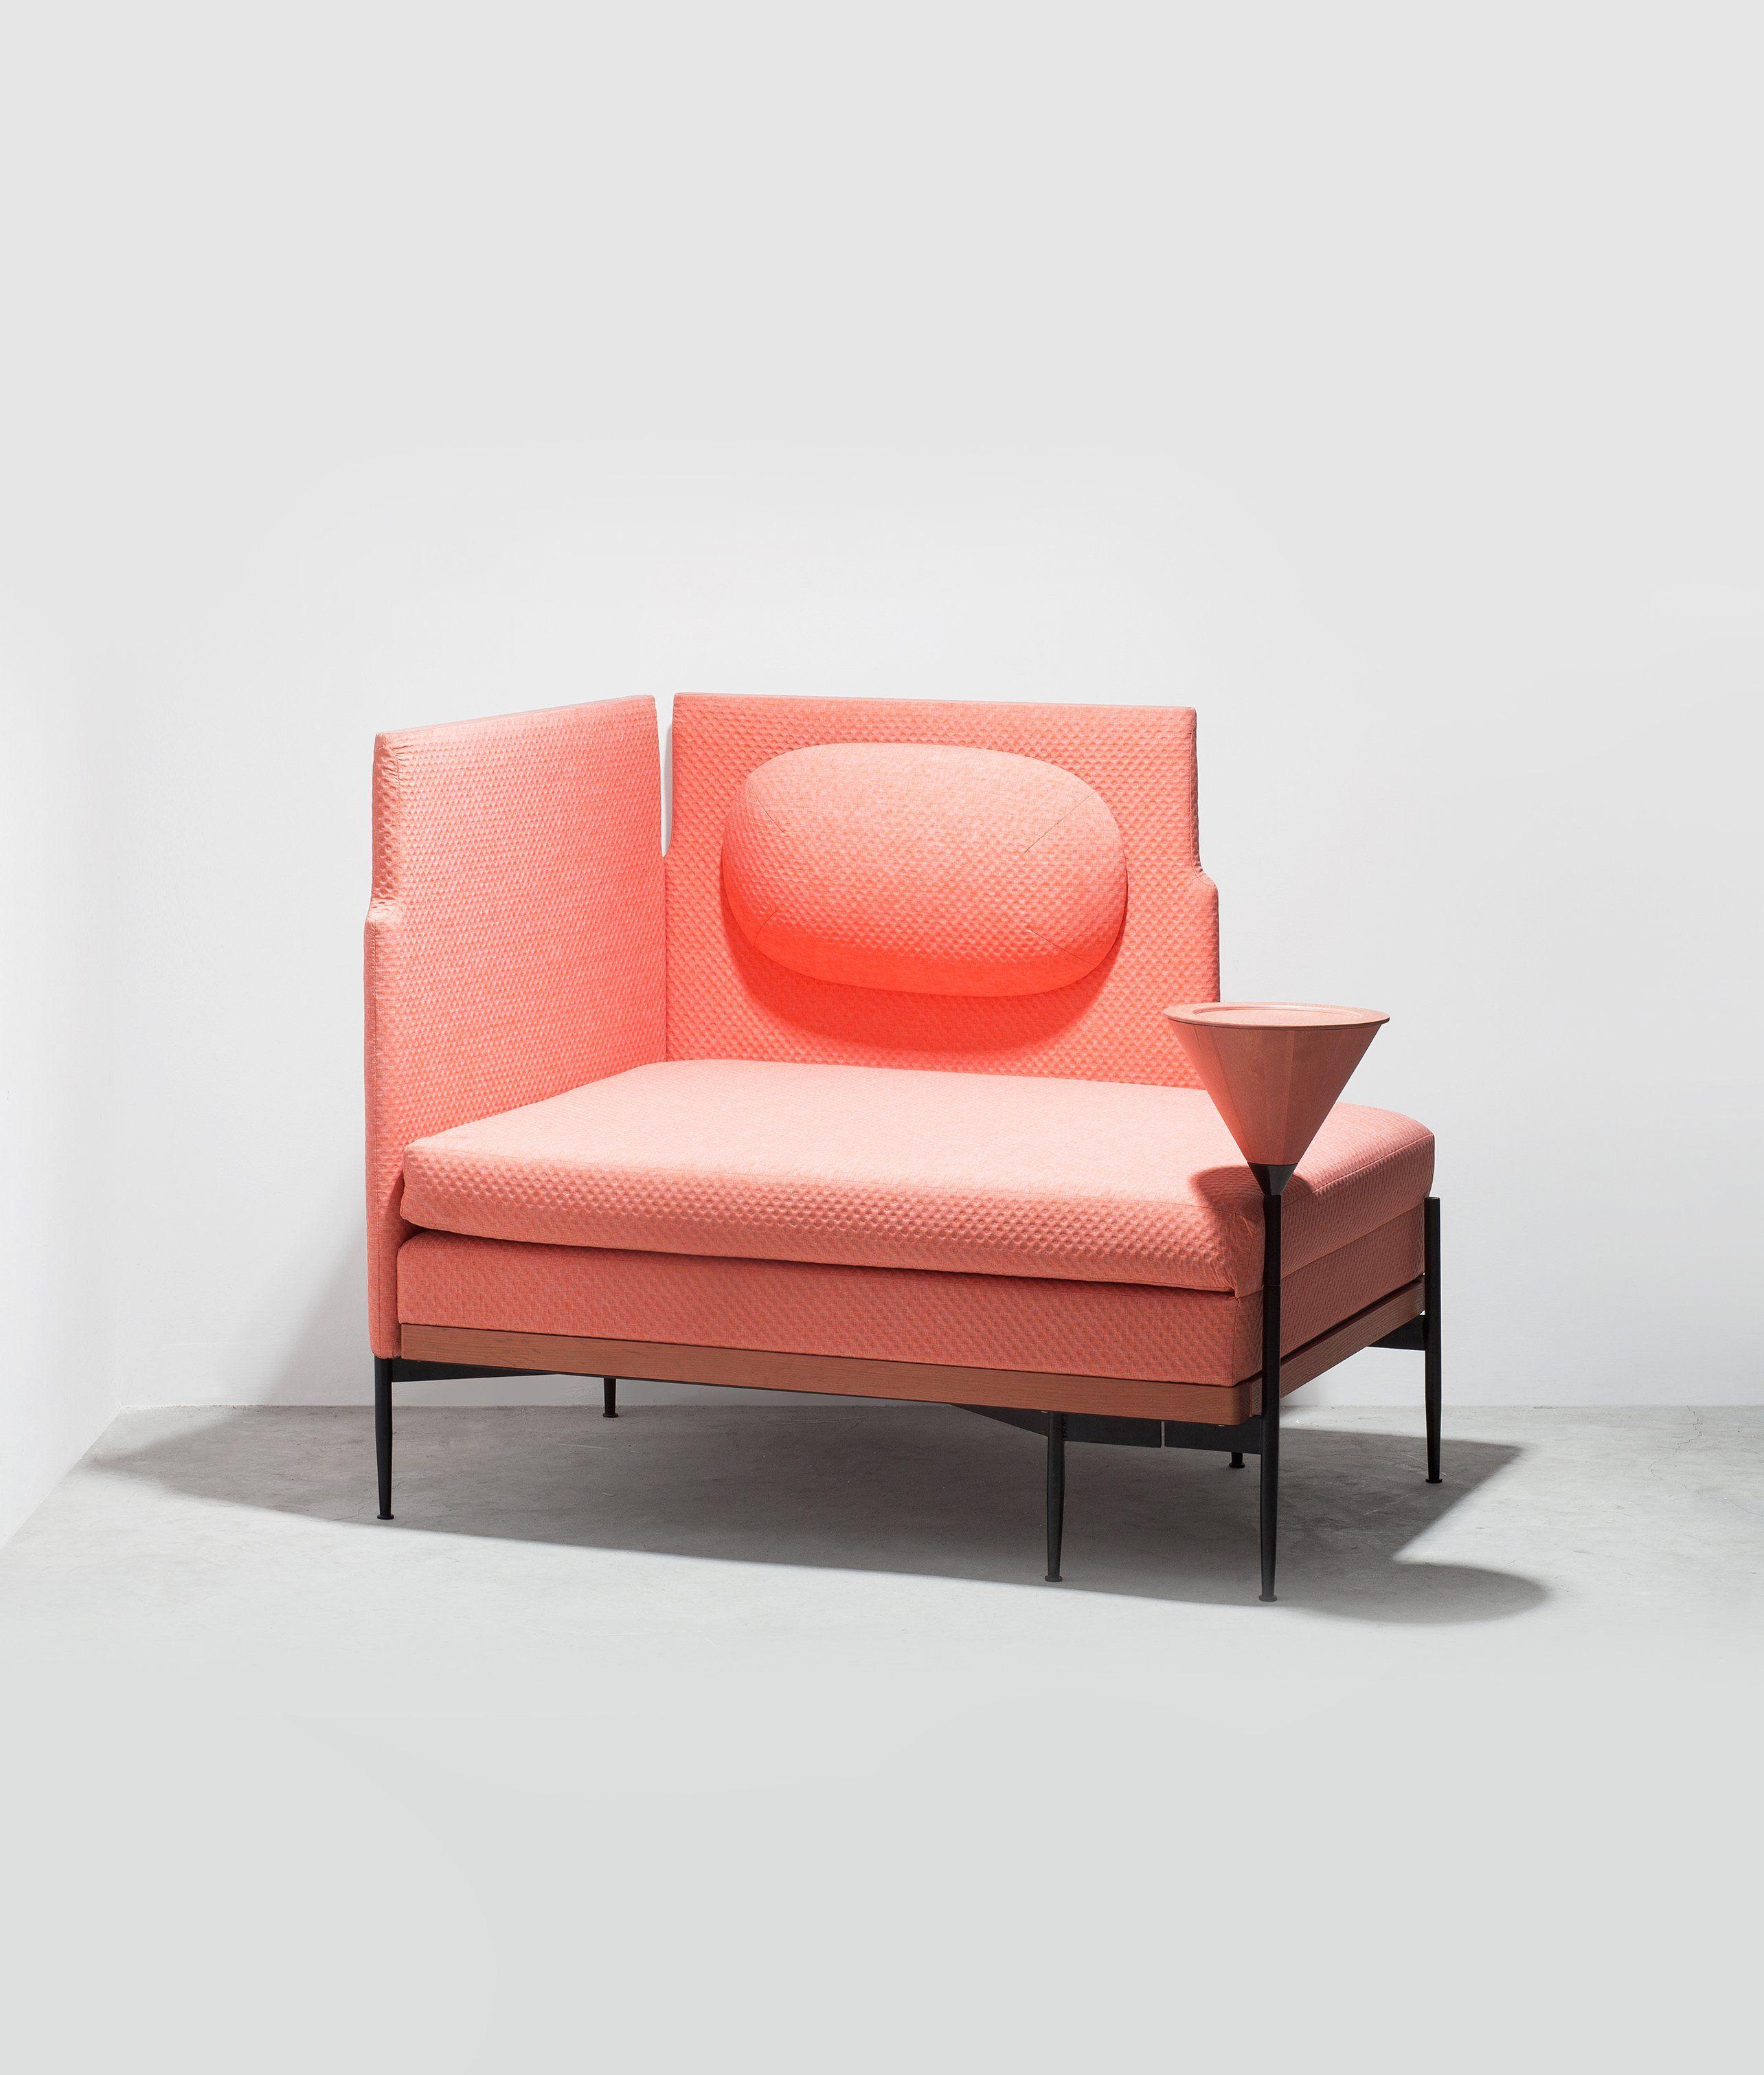 Stretch sofa bed from ziinlife modern design furniture hong kong